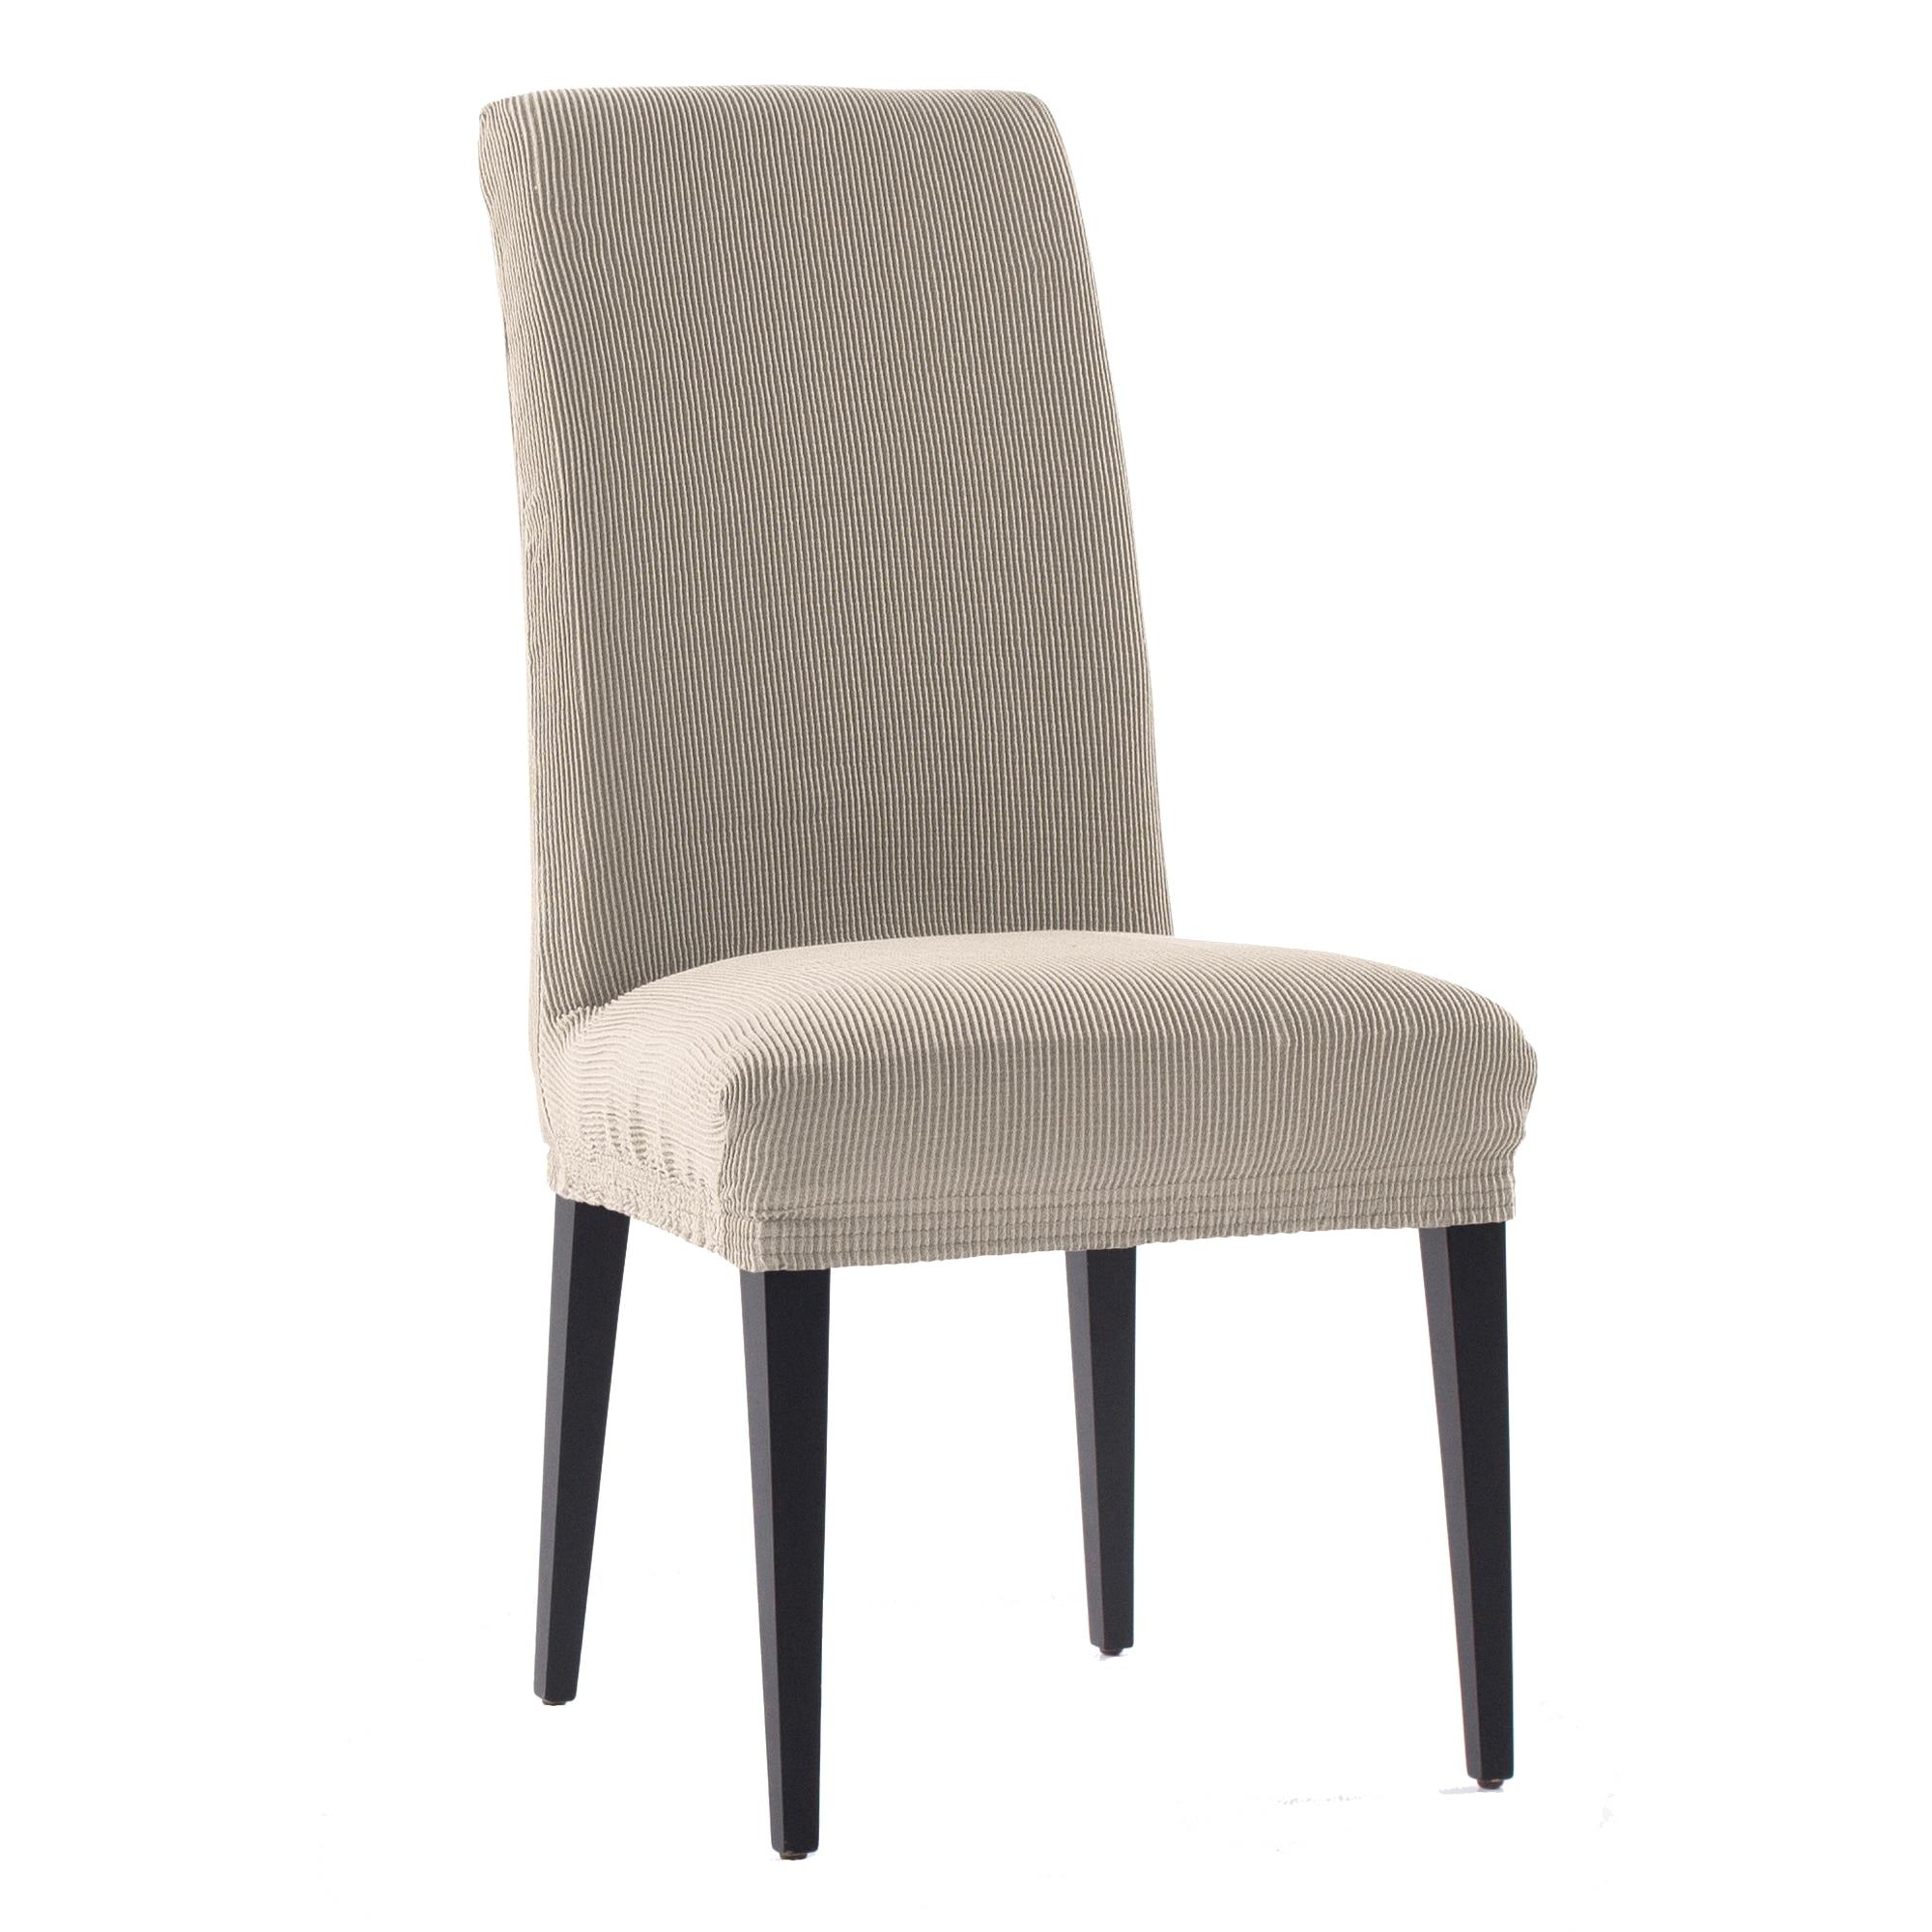 Fotografie Set 2 huse elastice pentru scaune Kring Nairobi, cu spatar de pana la 50 cm, 60% bumbac+ 35% poliester + 5% elastan, Bej